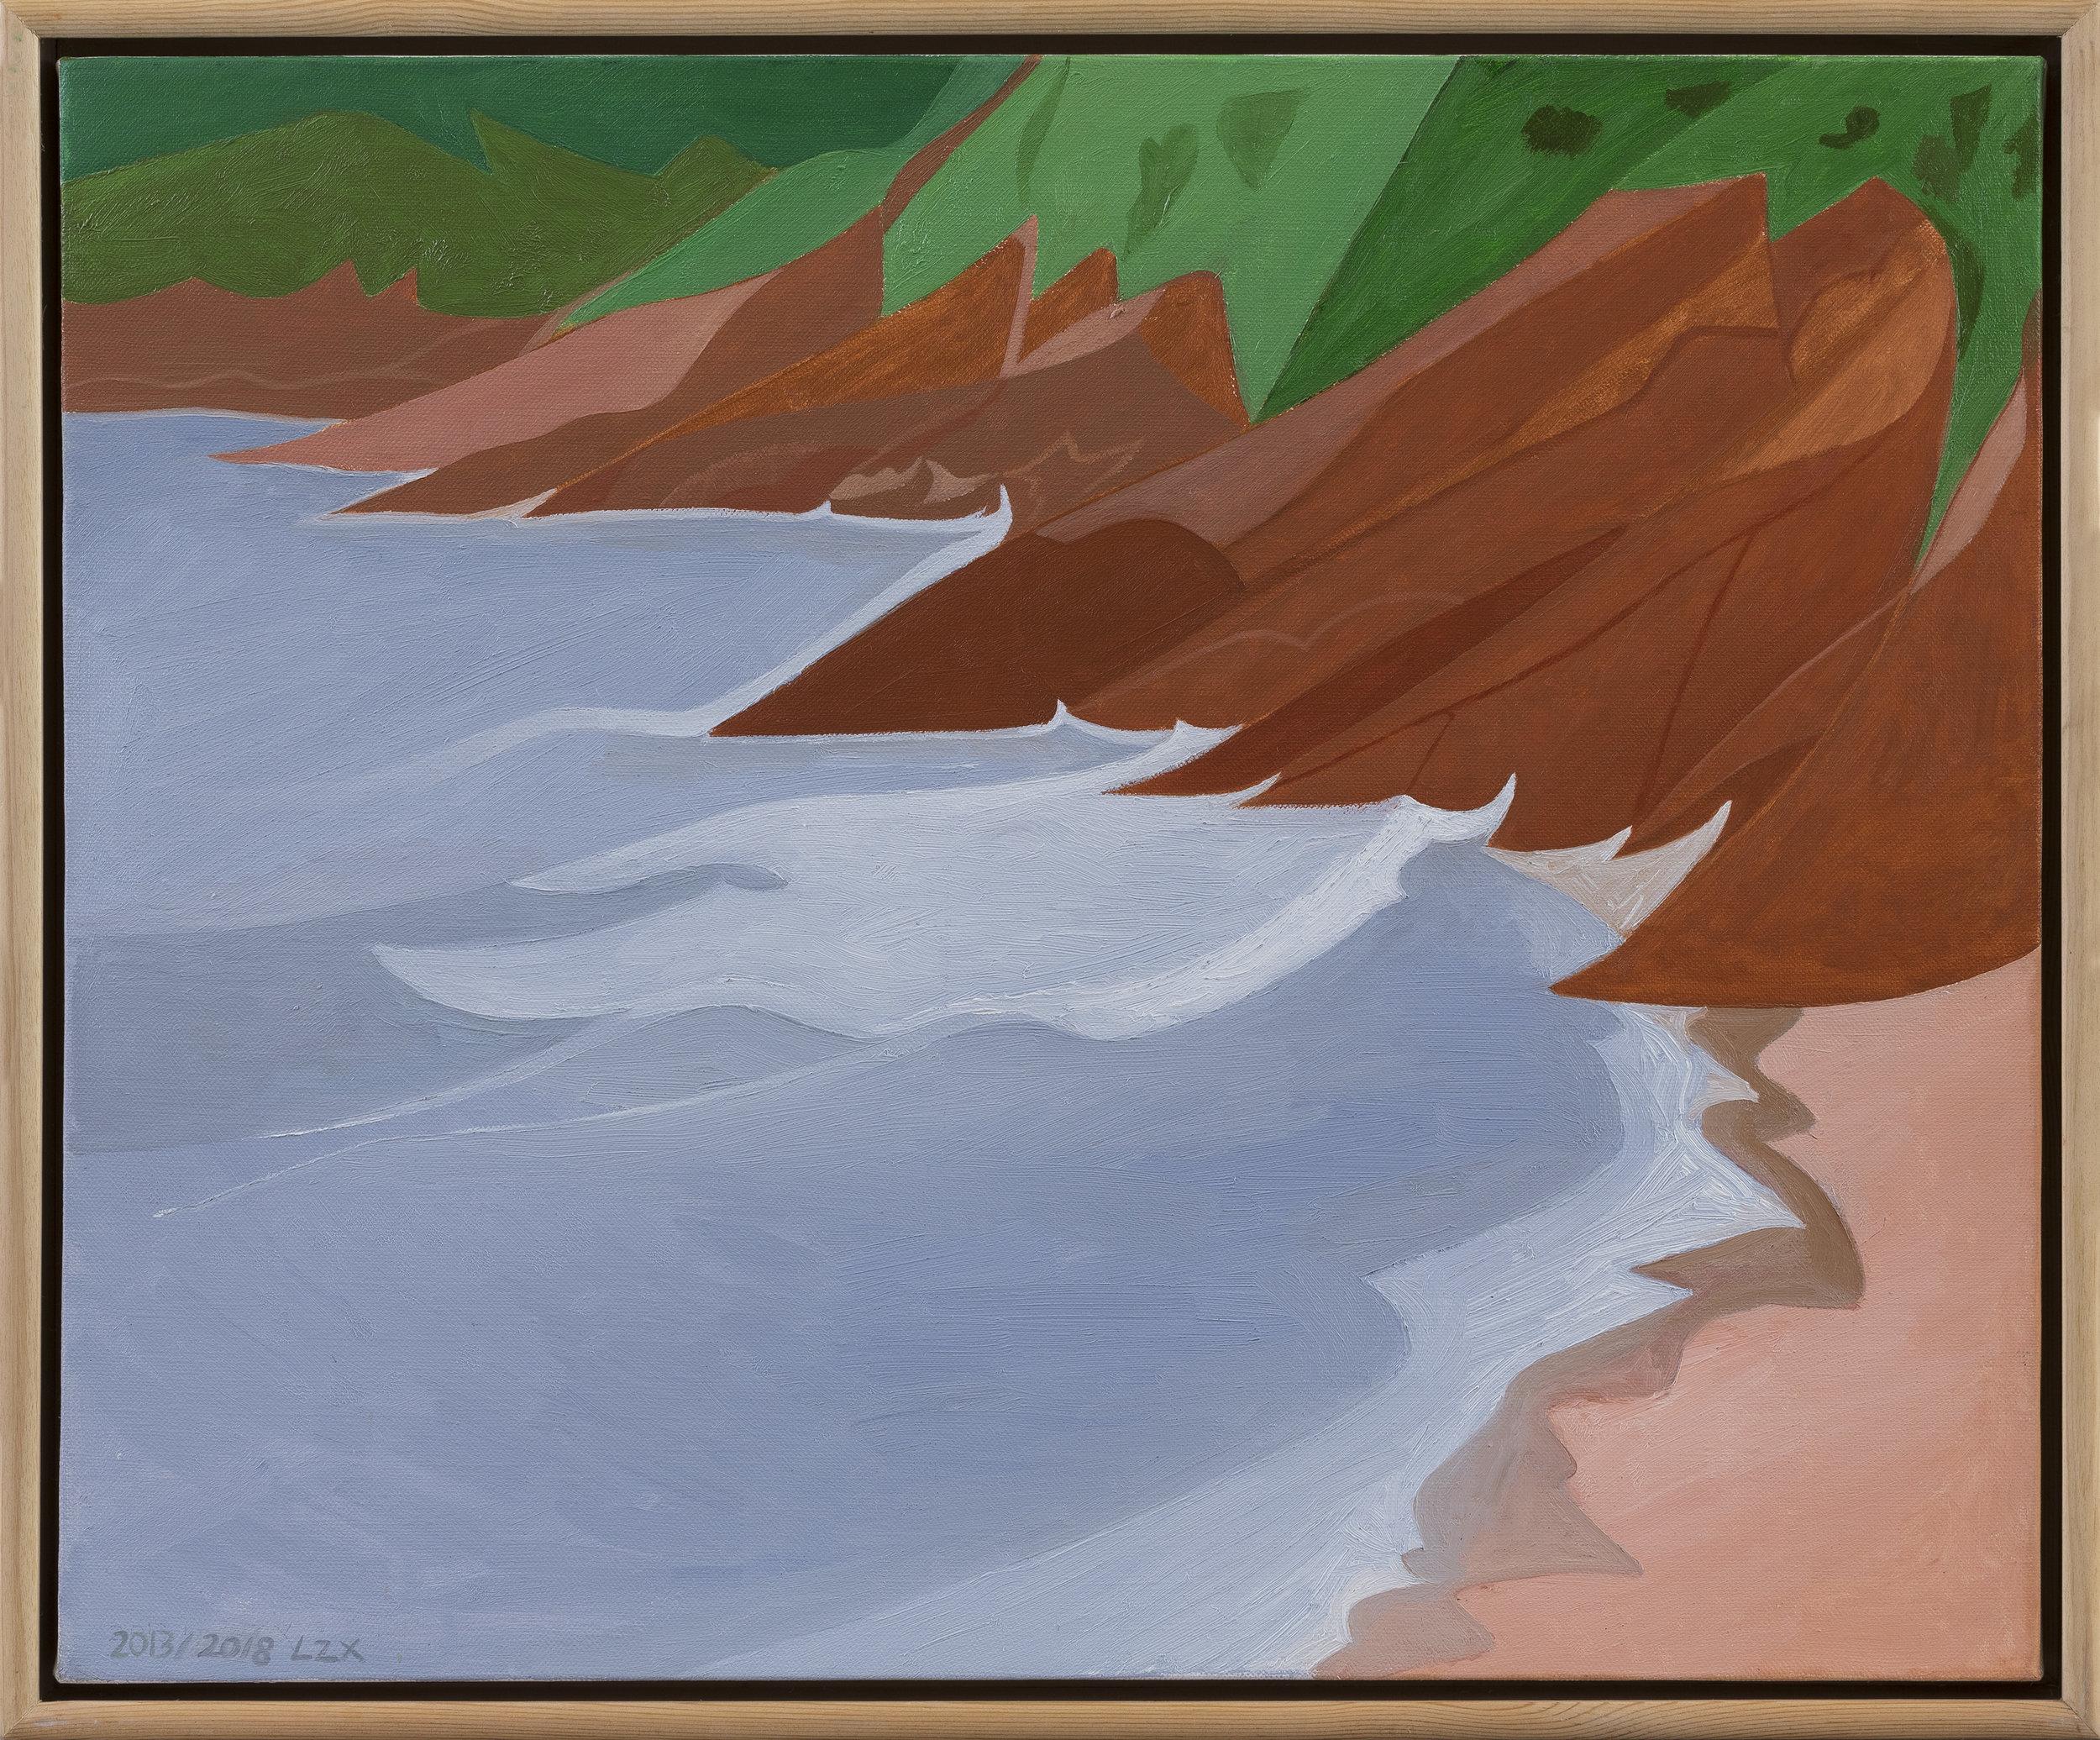 Lan Zhaoxing,  Seaside 1 , 2013. Oil on canvas, 19.6 x 23.6 inch © Lan Zhaoxing, courtesy Fou Gallery